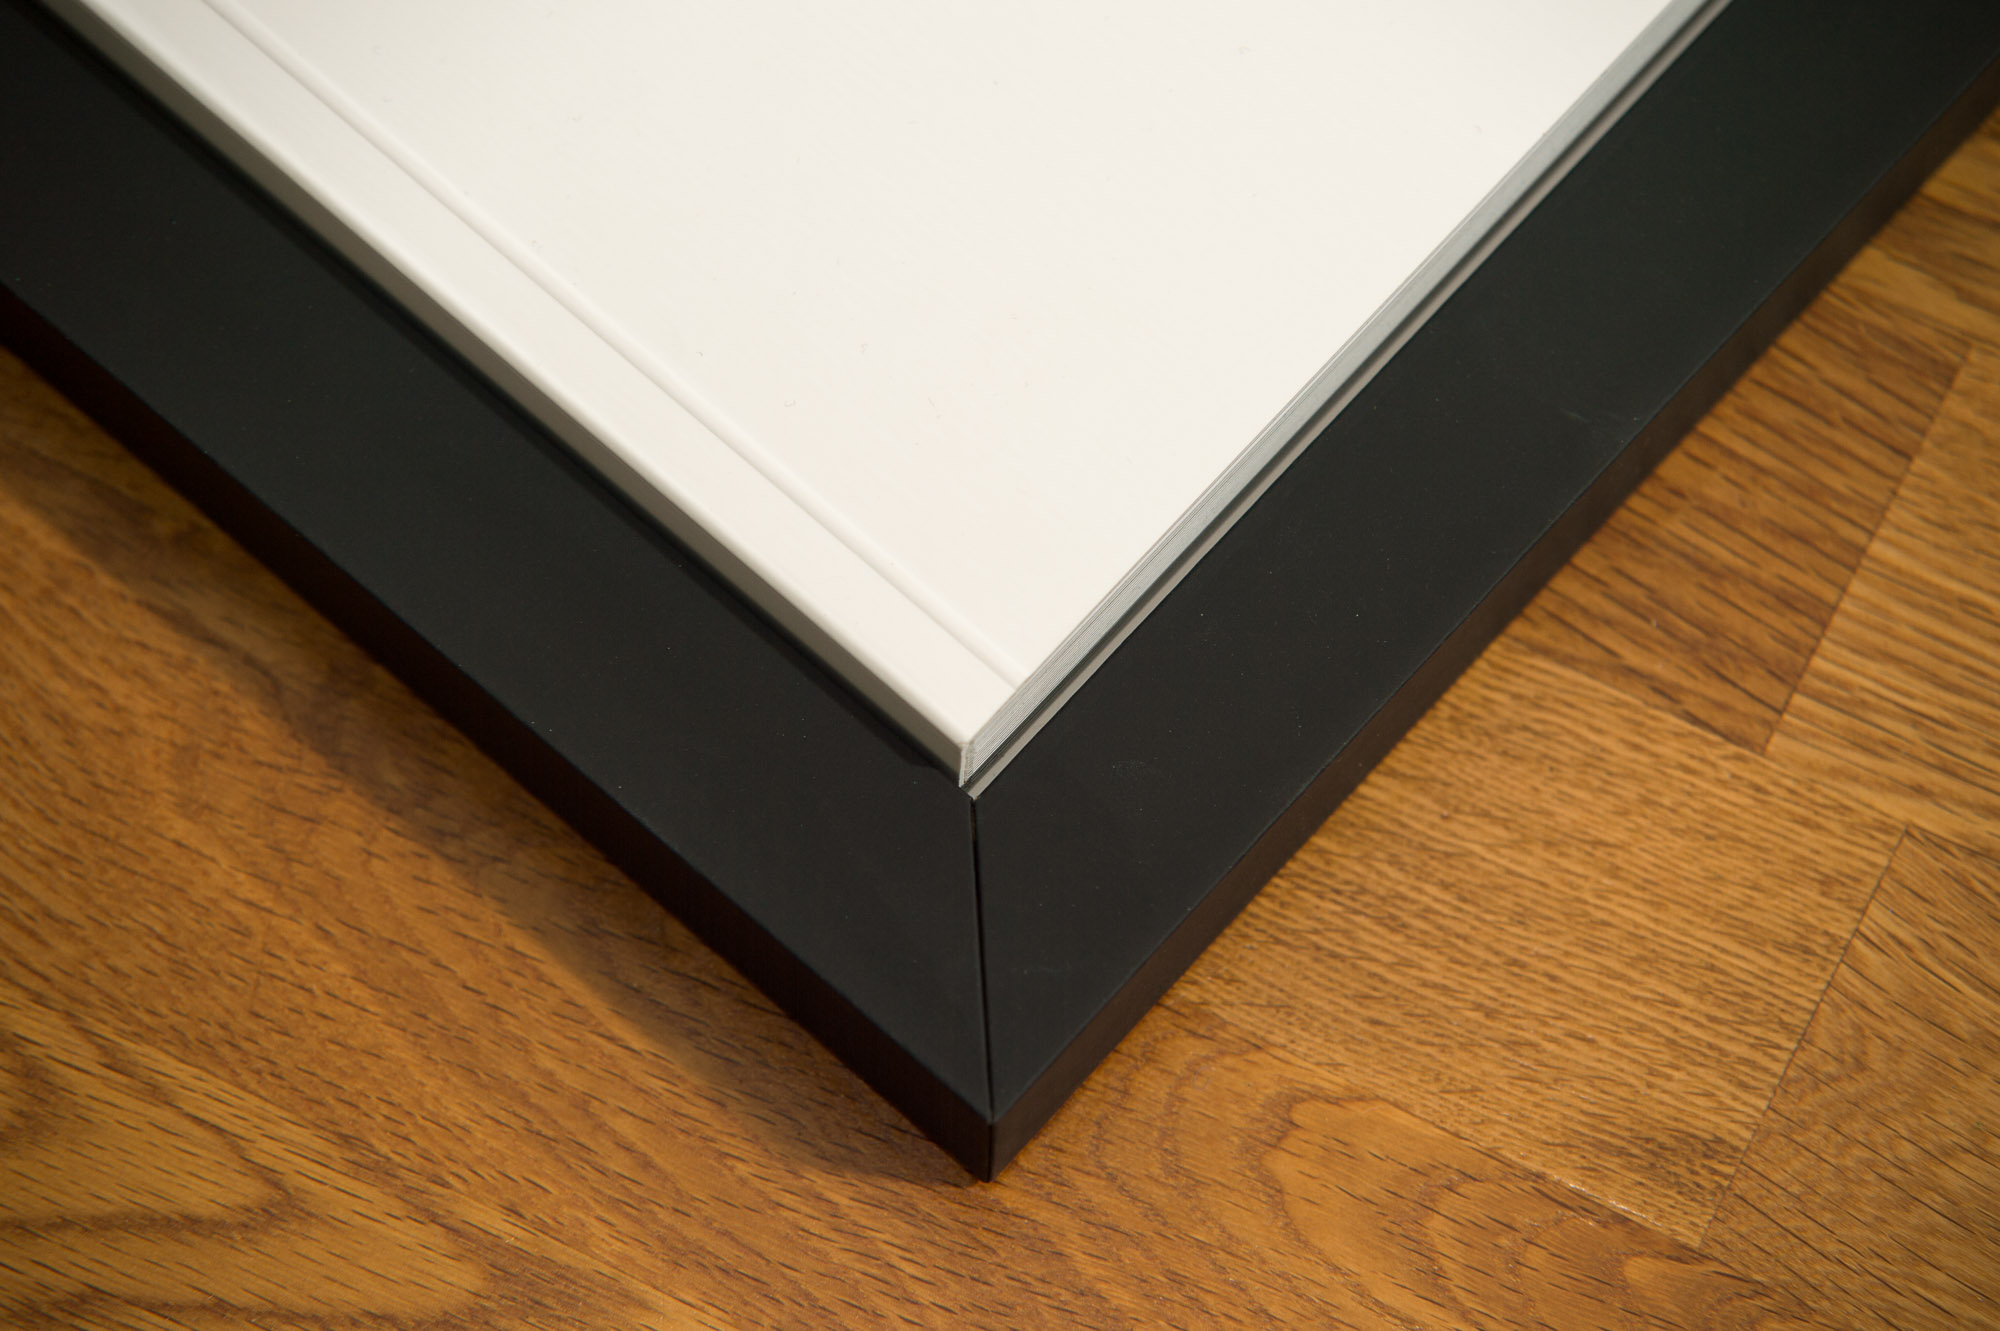 Fotobuch YoungBook B2000 4 - Fotobücher